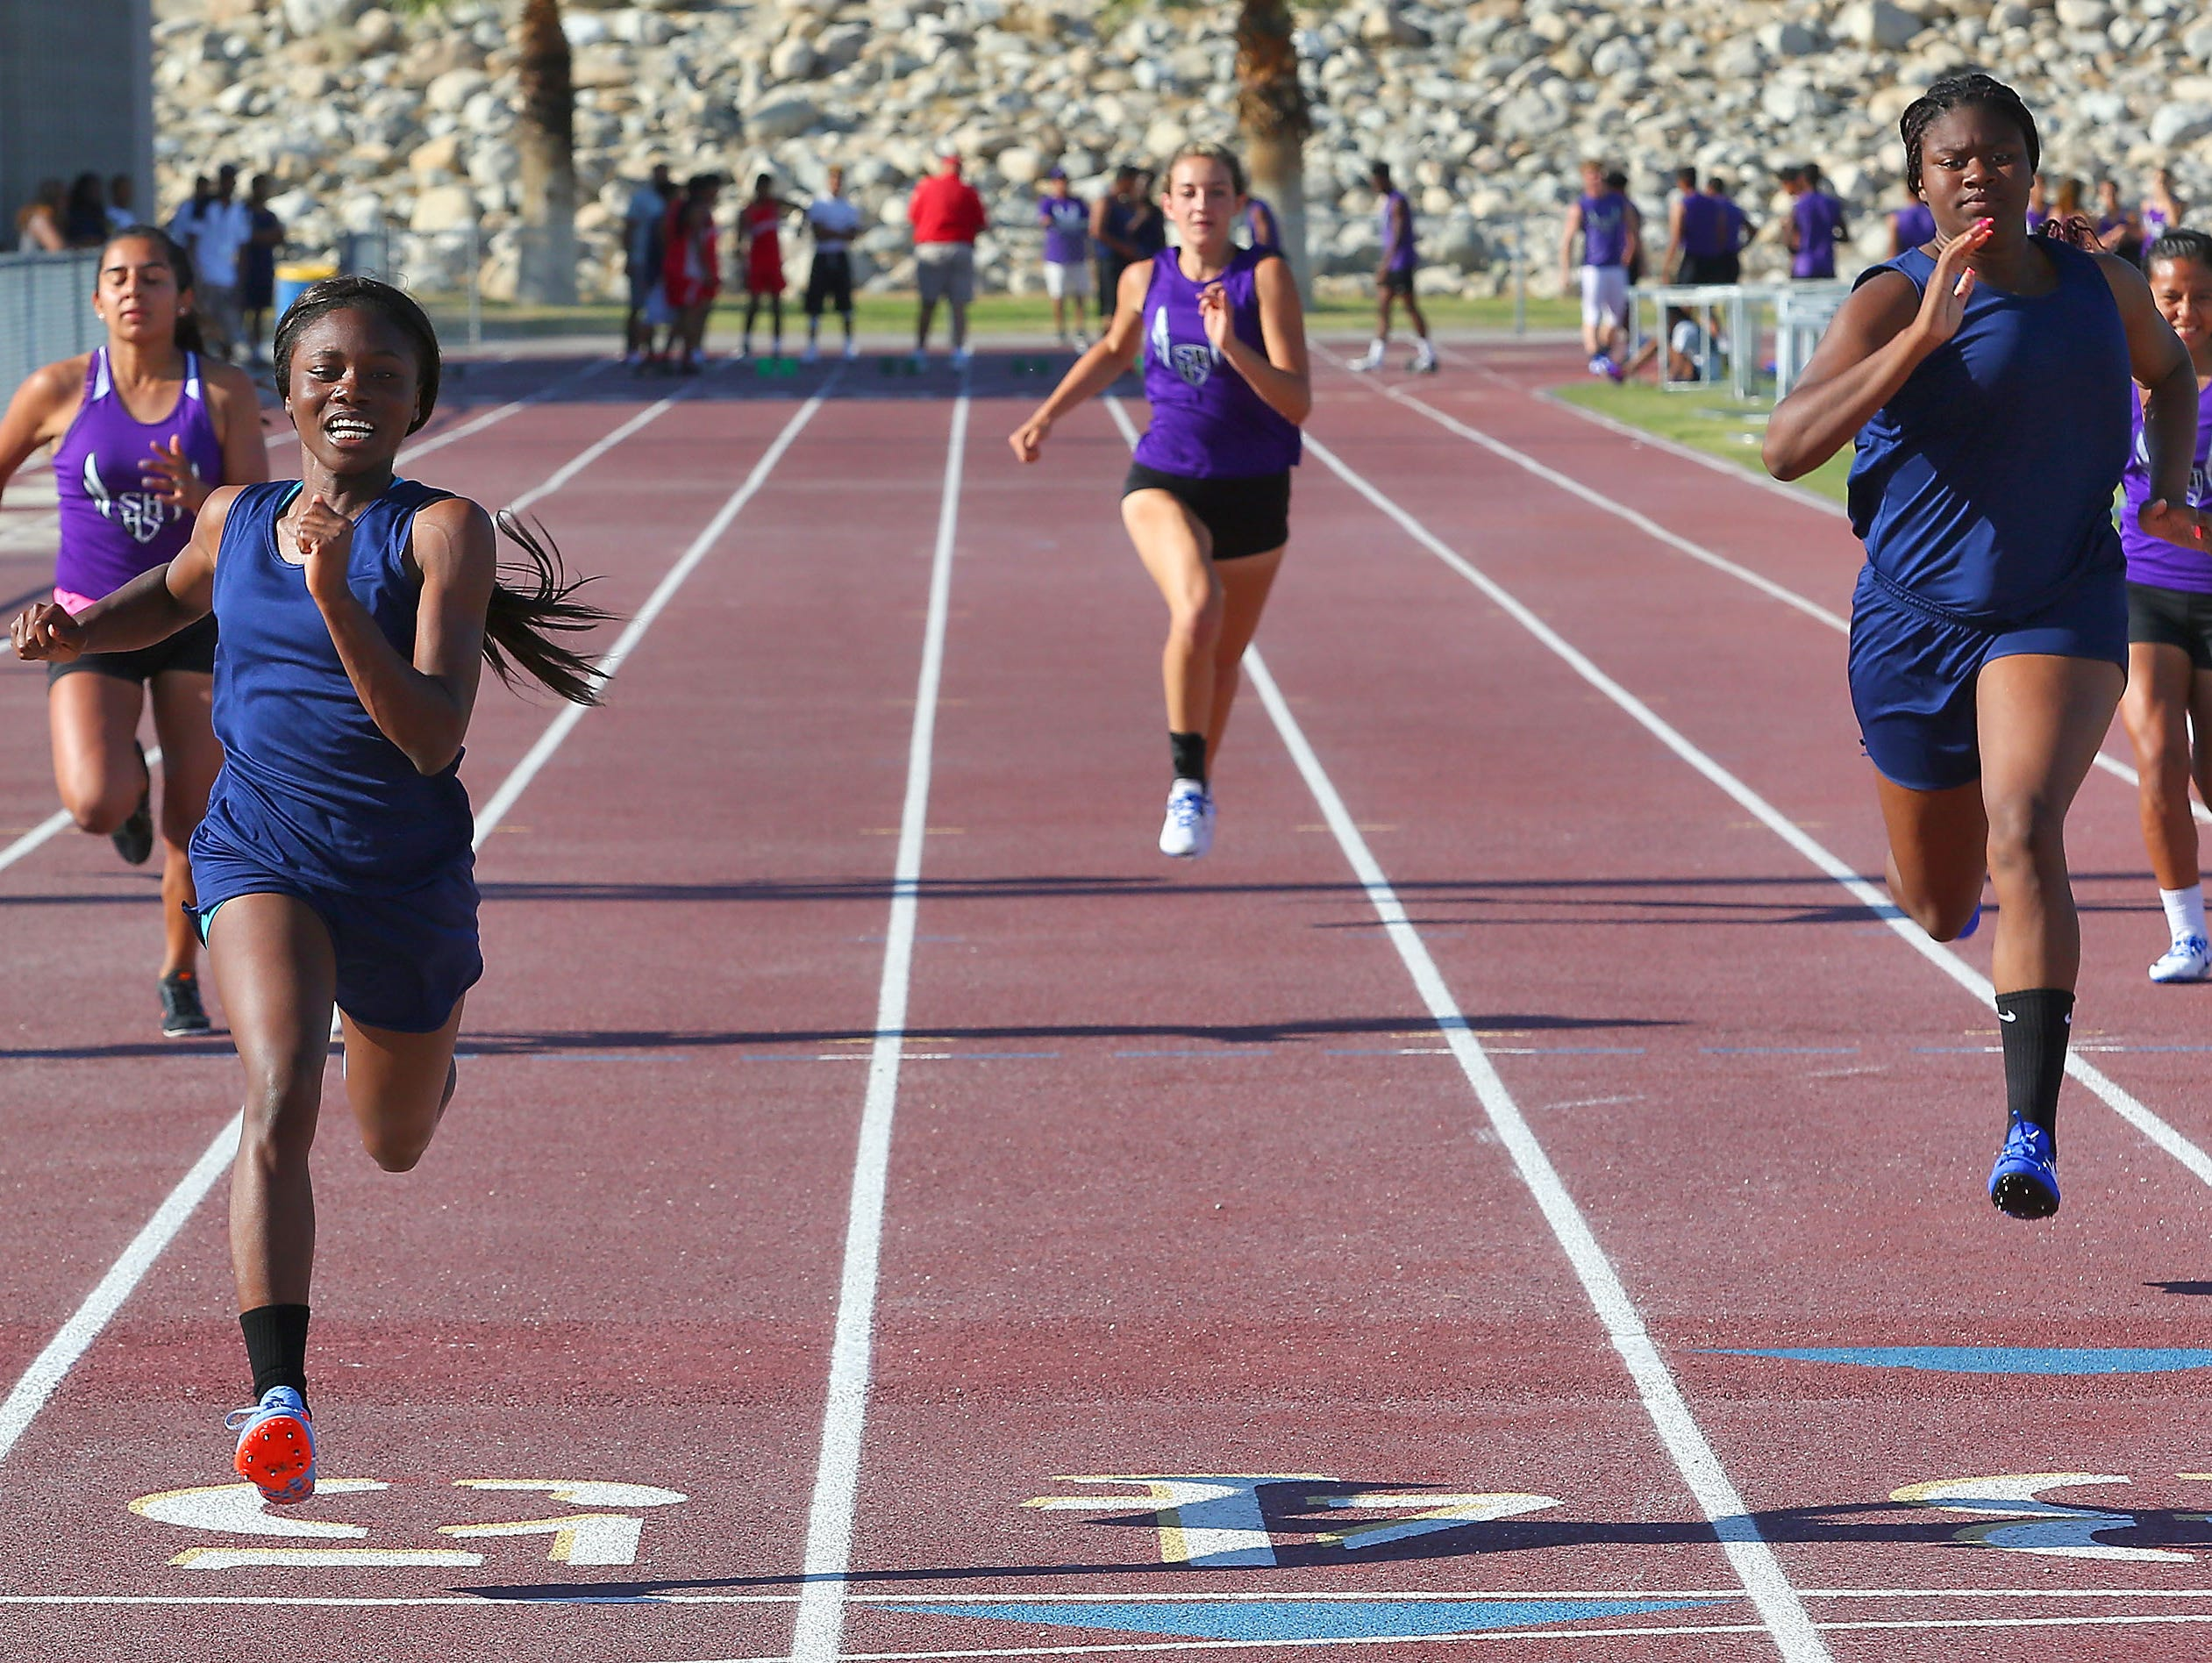 Nykaya Botley wins her heat in the 100 meter at Desert Hot Springs High School, April 13, 2016.